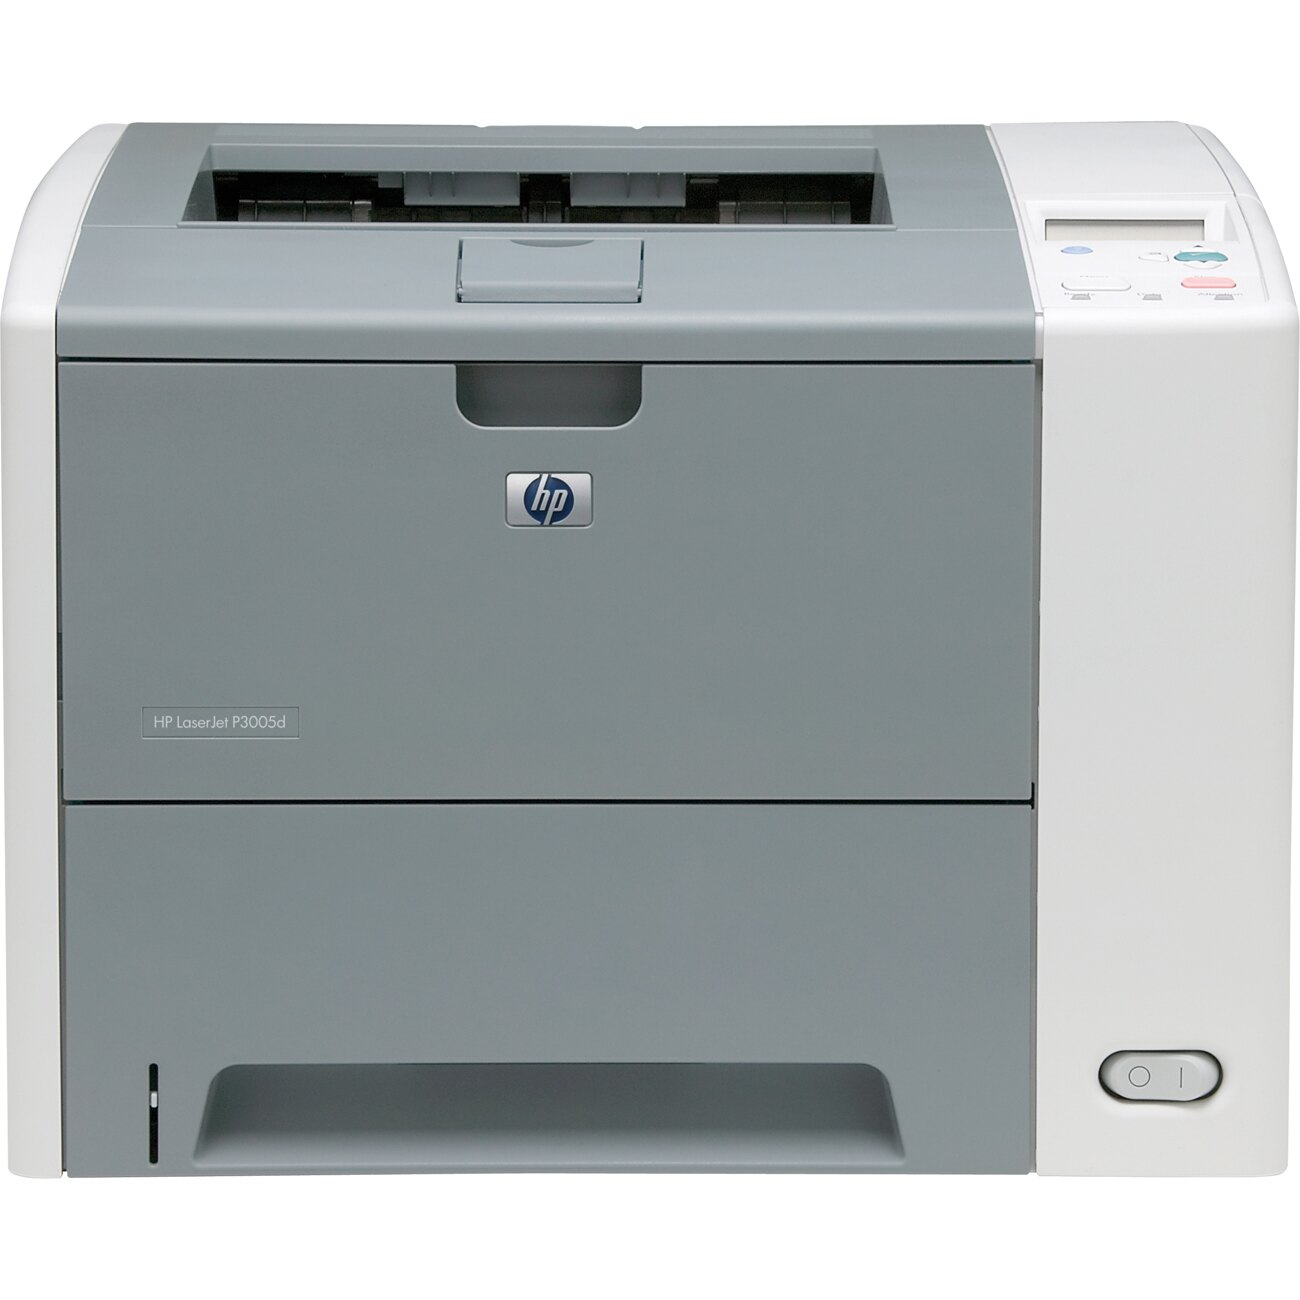 HP LaserJet P3005D Printer - Monochrome - USB, Parallel - PC, Mac, SPARC 0